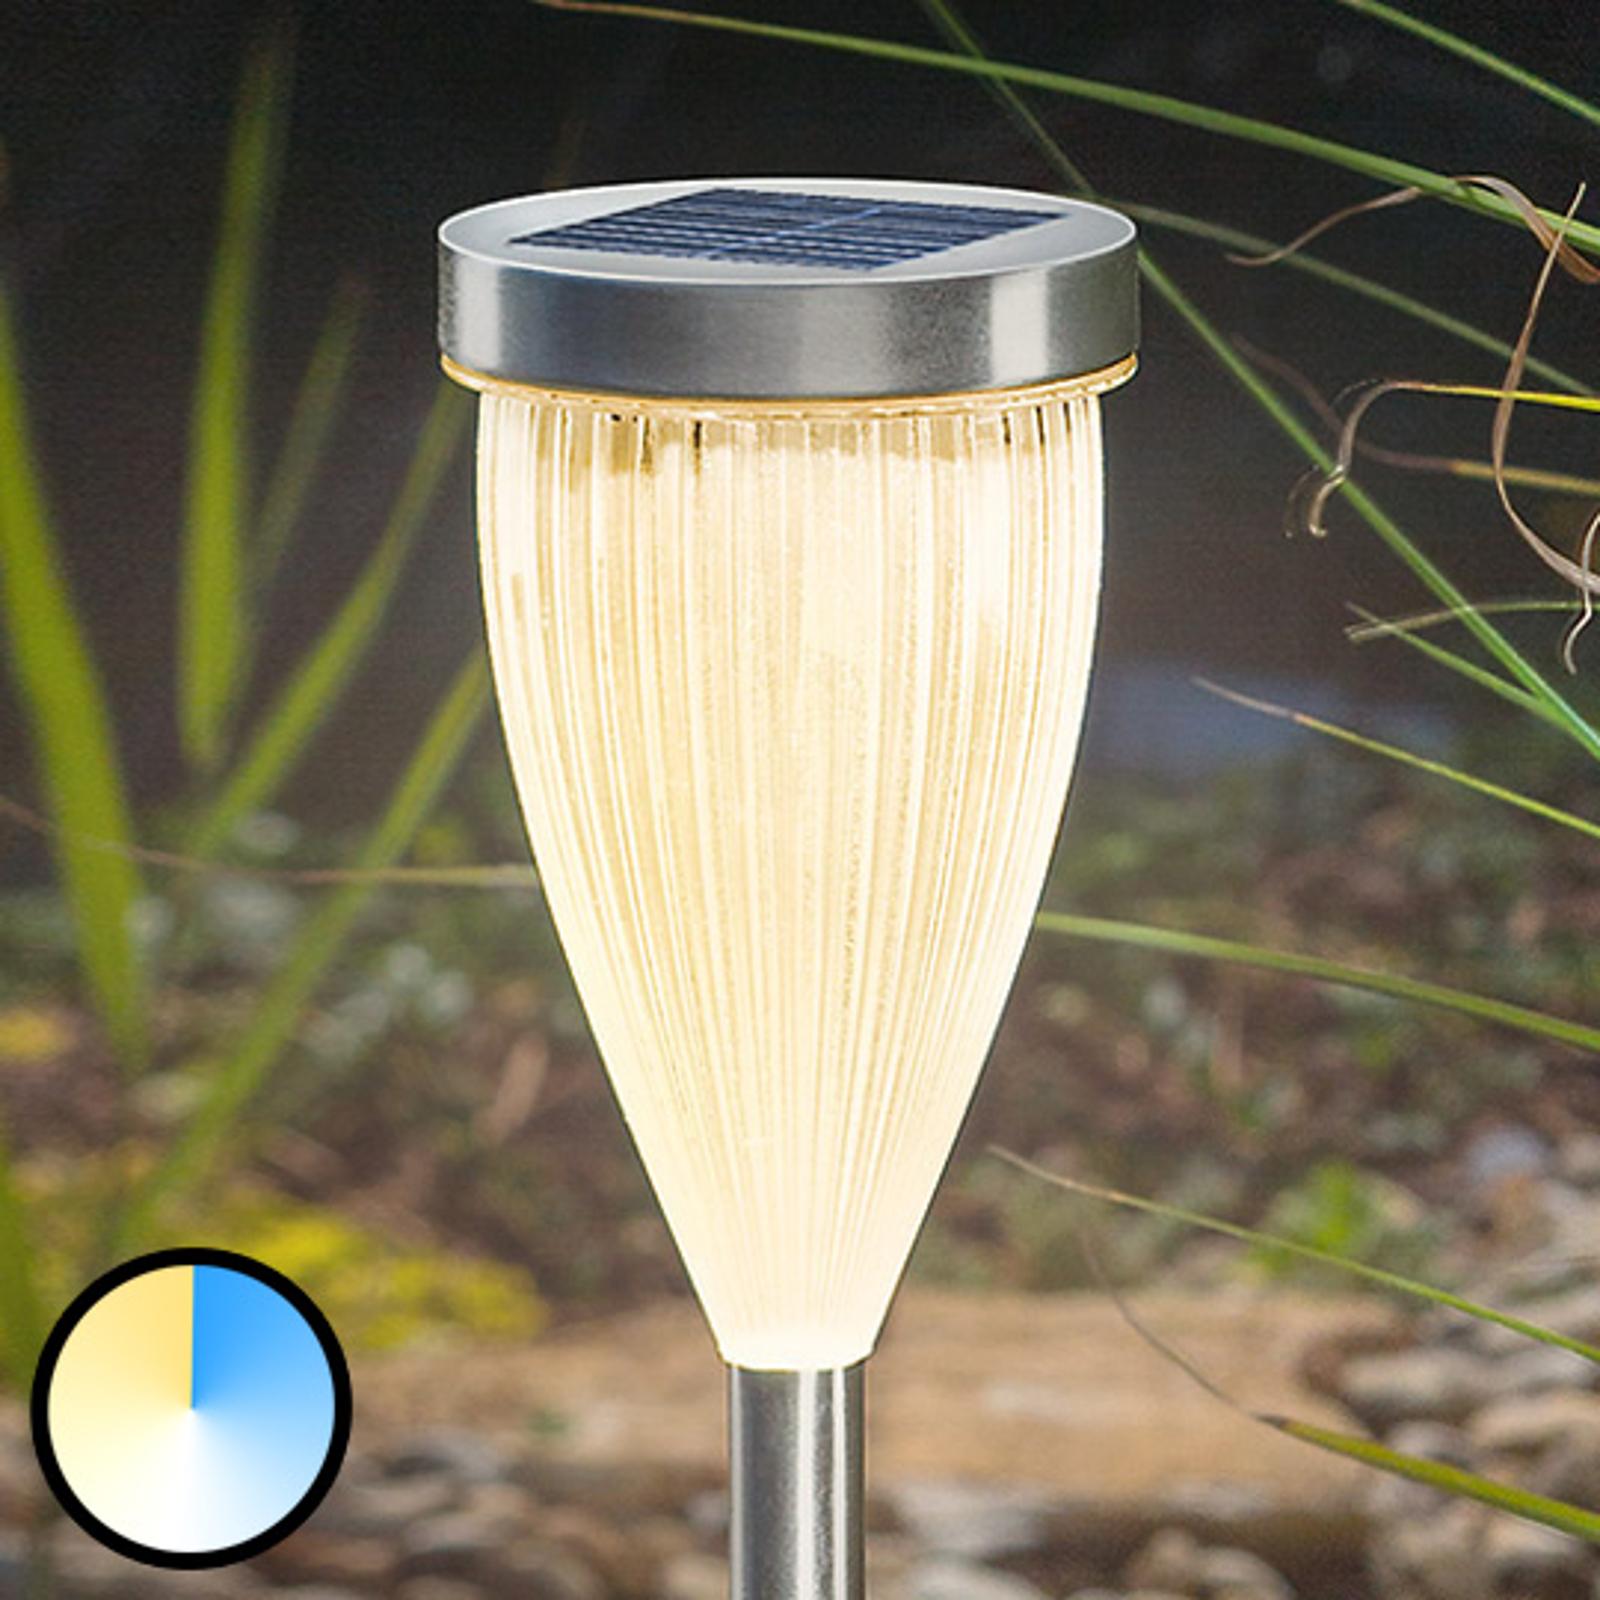 Dream Light - luminaire solaire LED stylé